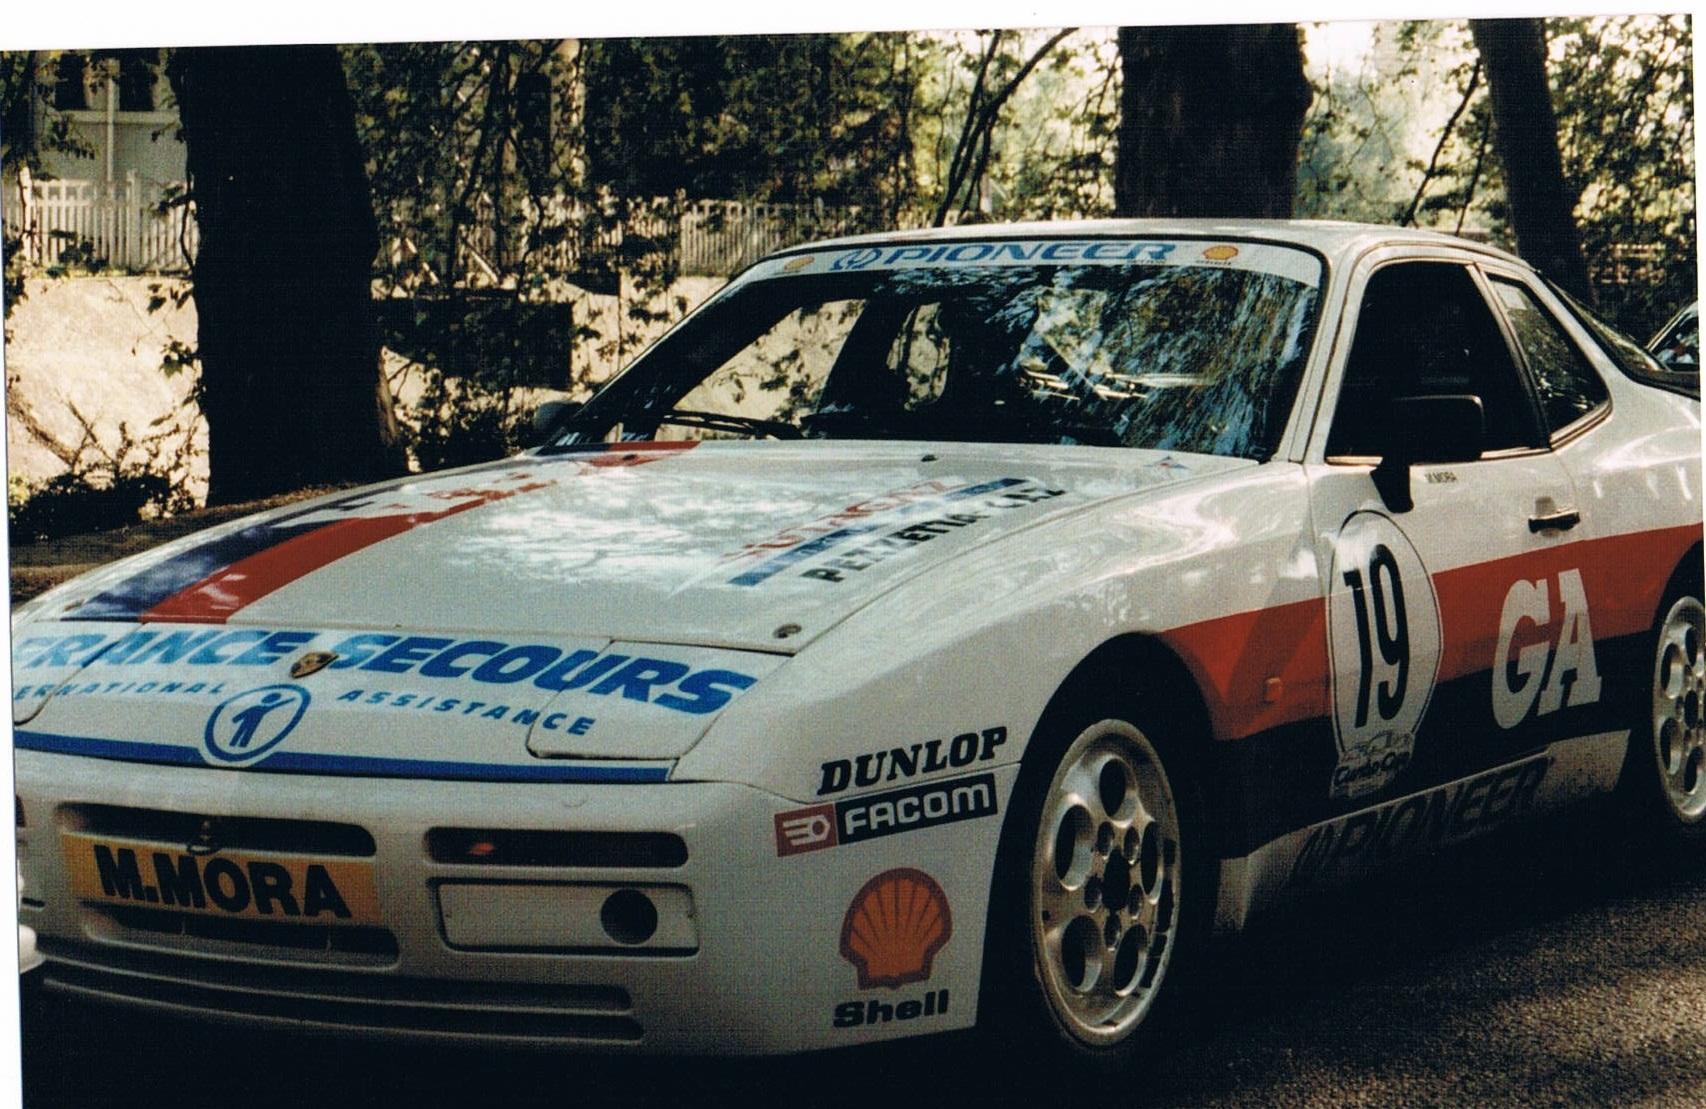 1988 Porsche 944 Turbo Cup: Featured Porsche for Sale